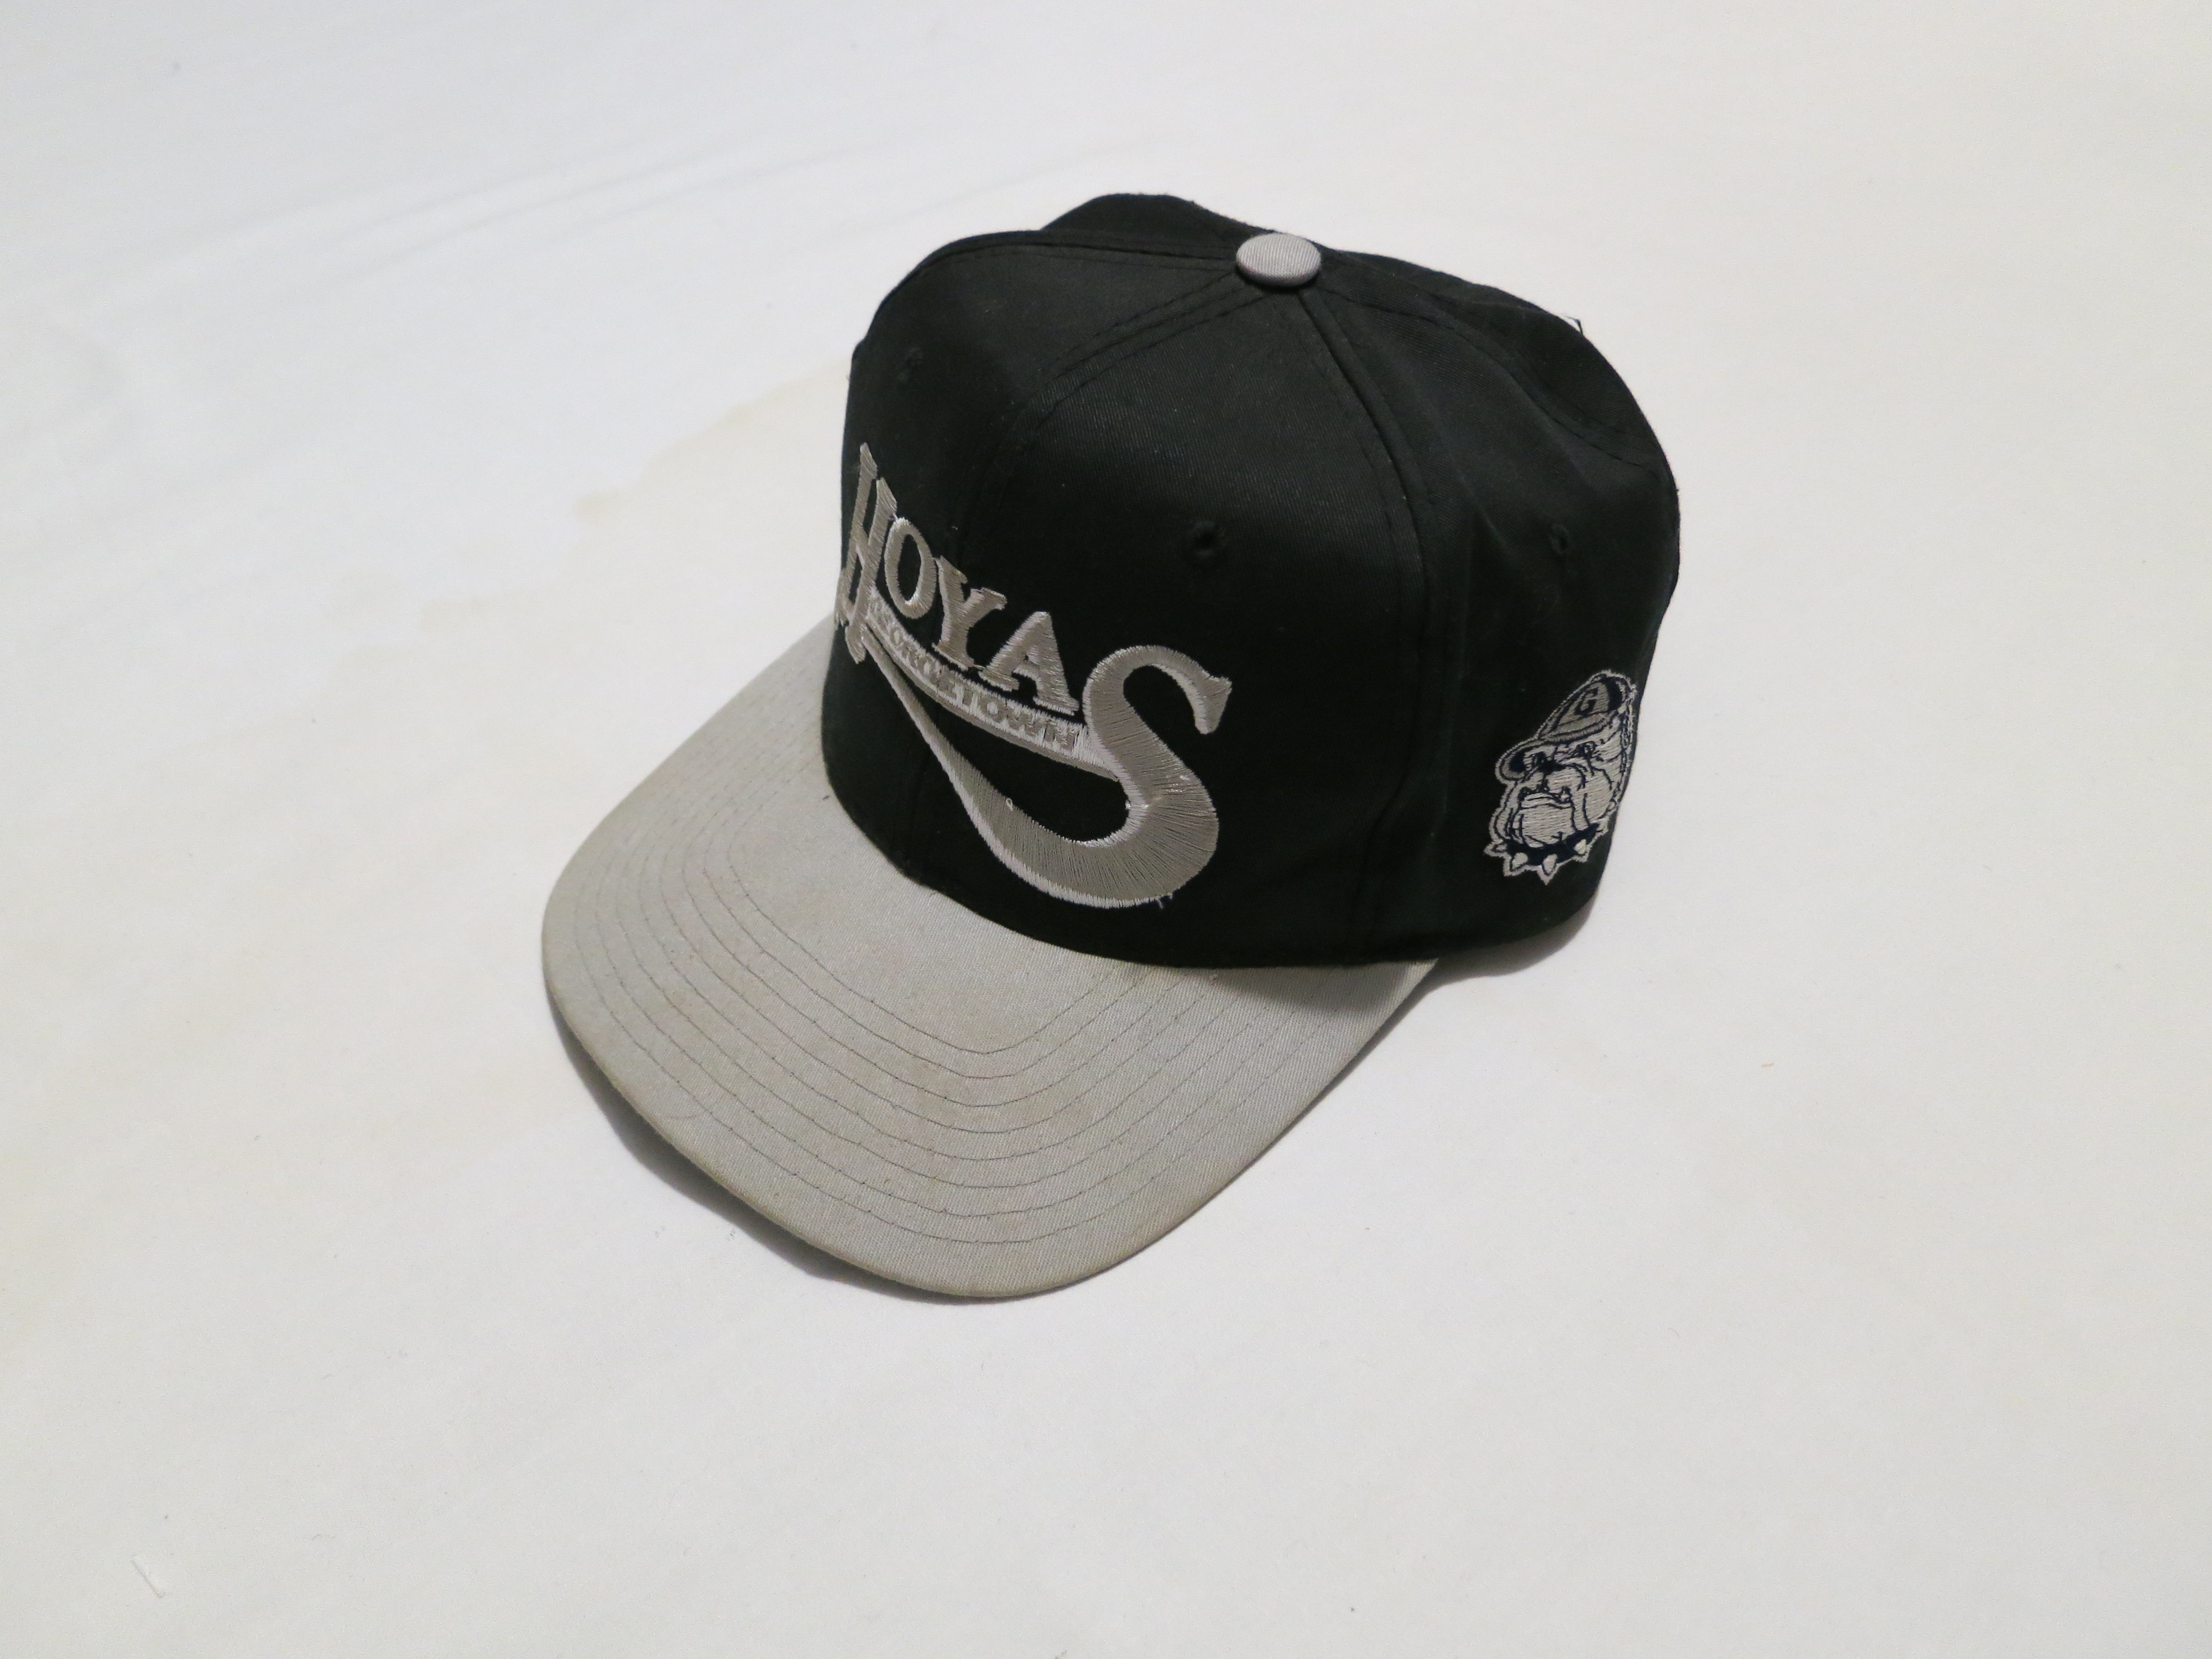 3e6b6a04636 Nike Rare Vintage Ncaa Georgetown Hoyas Starter Script Basketball Snapback  Hat Iverson